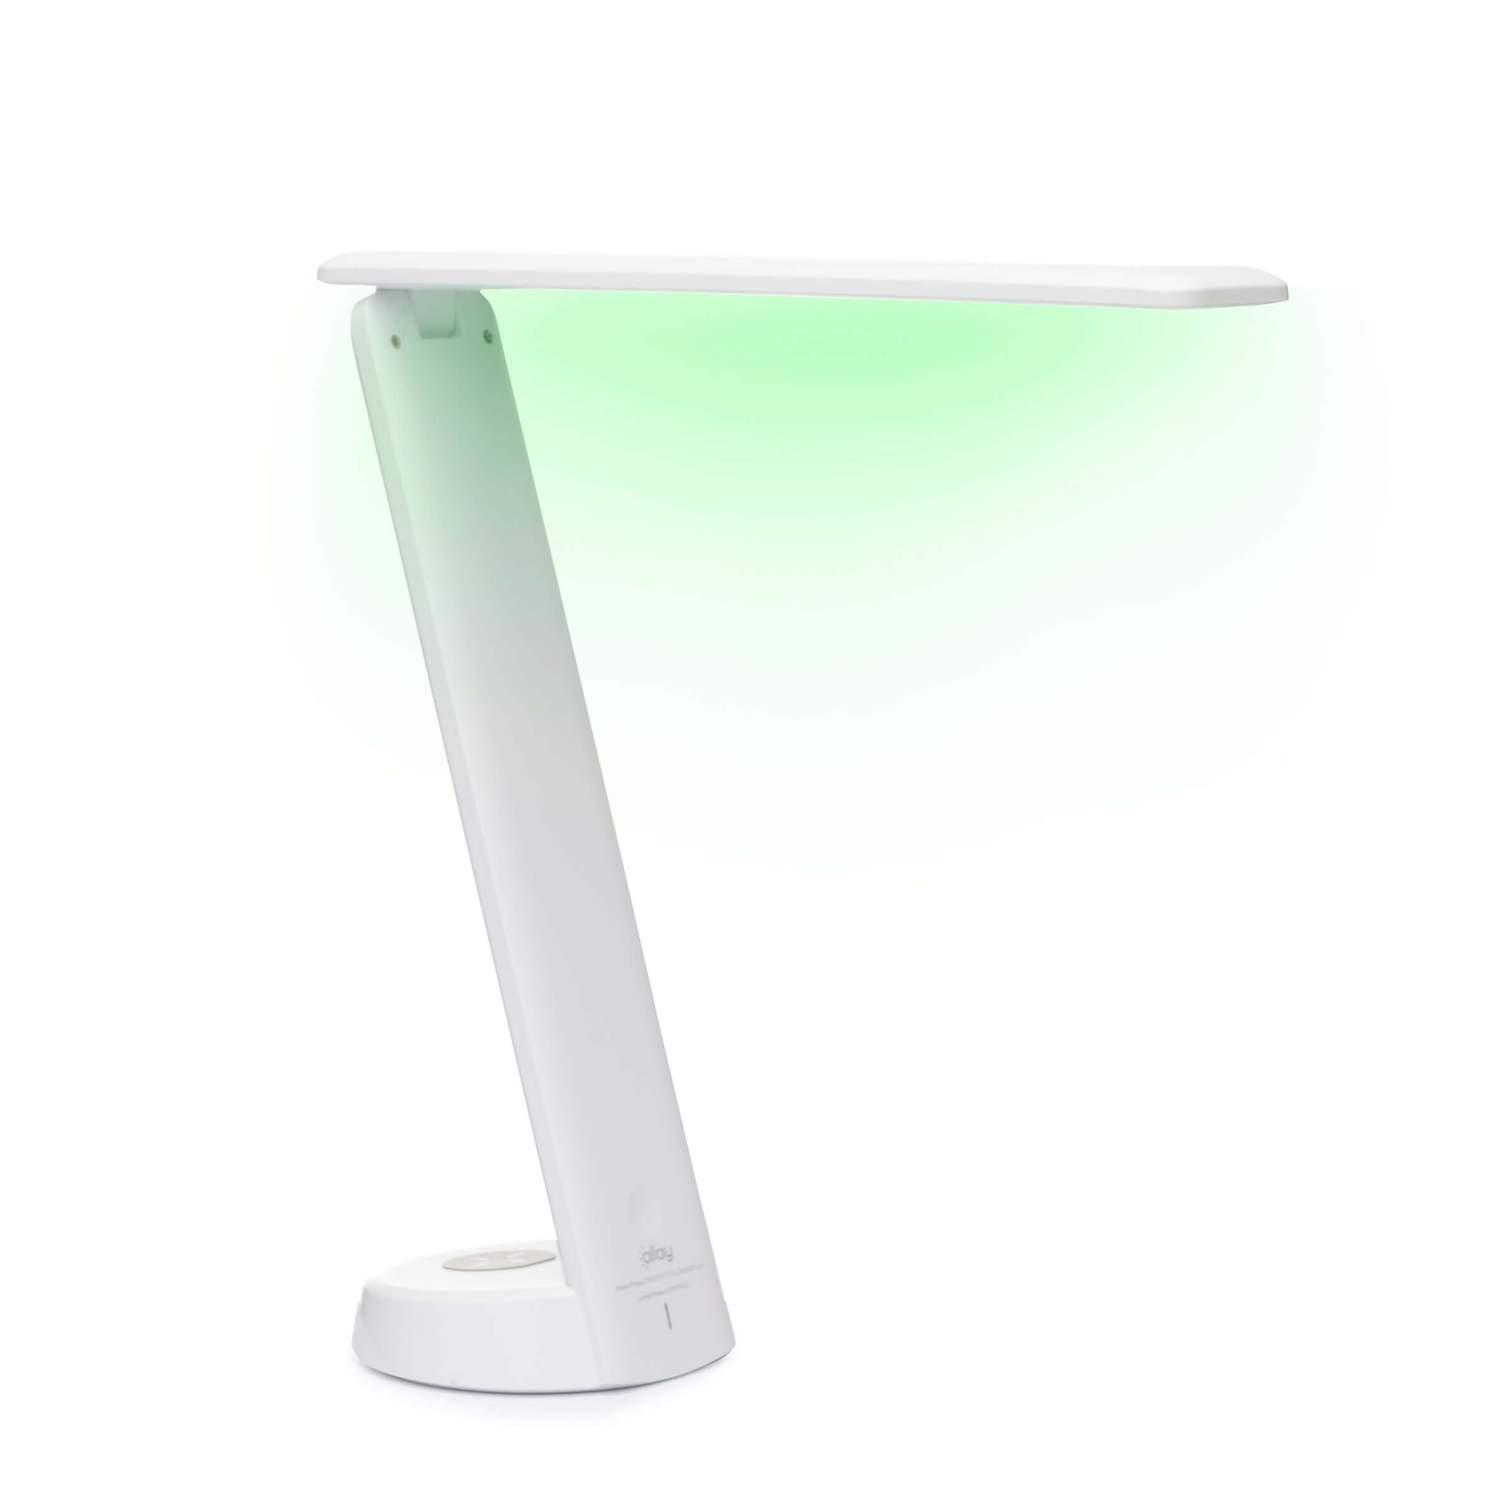 Photo of the Allay Desk Light emitting bright green light